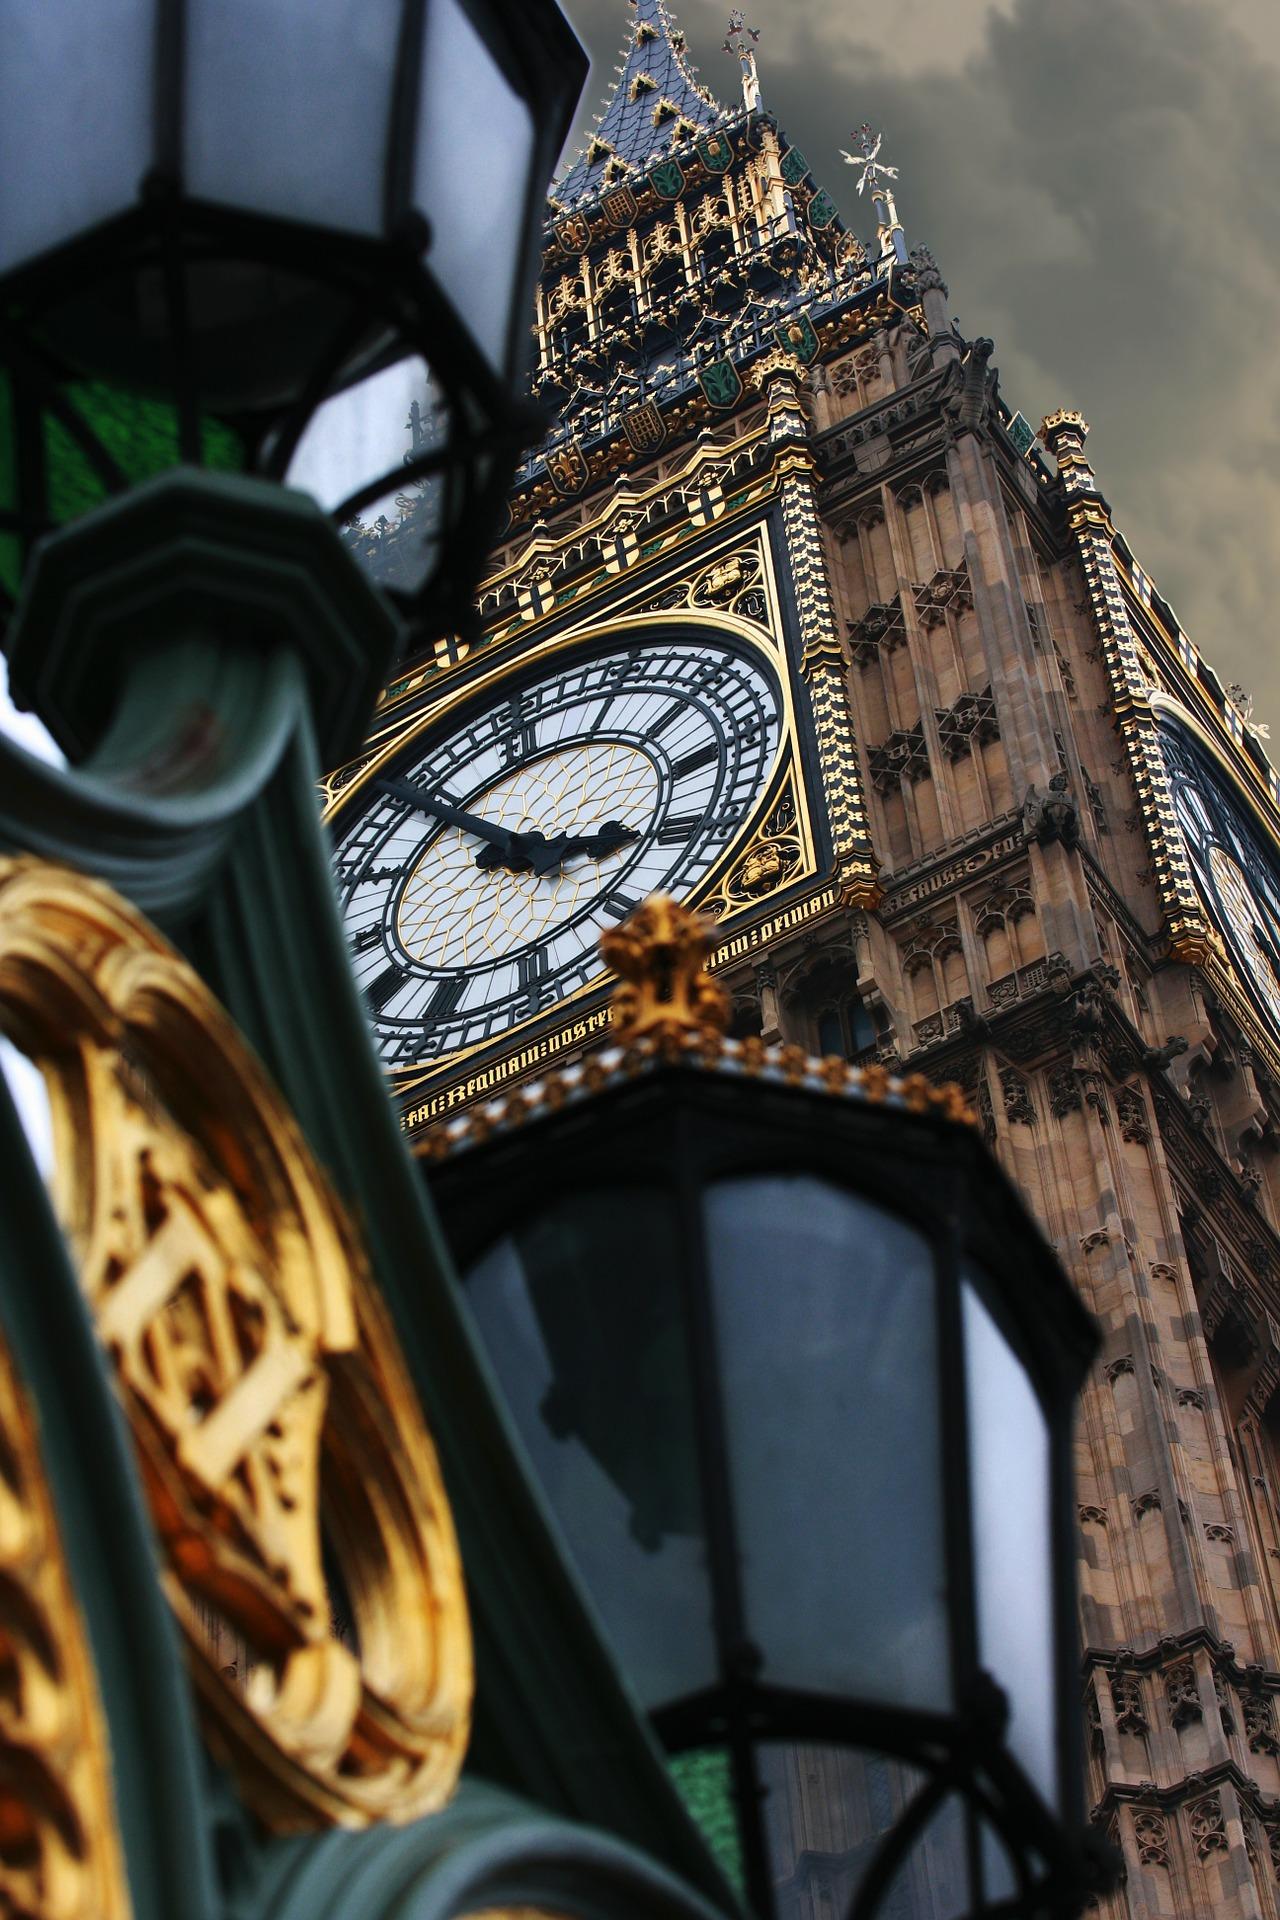 Saker du (troligen) inte visste om London